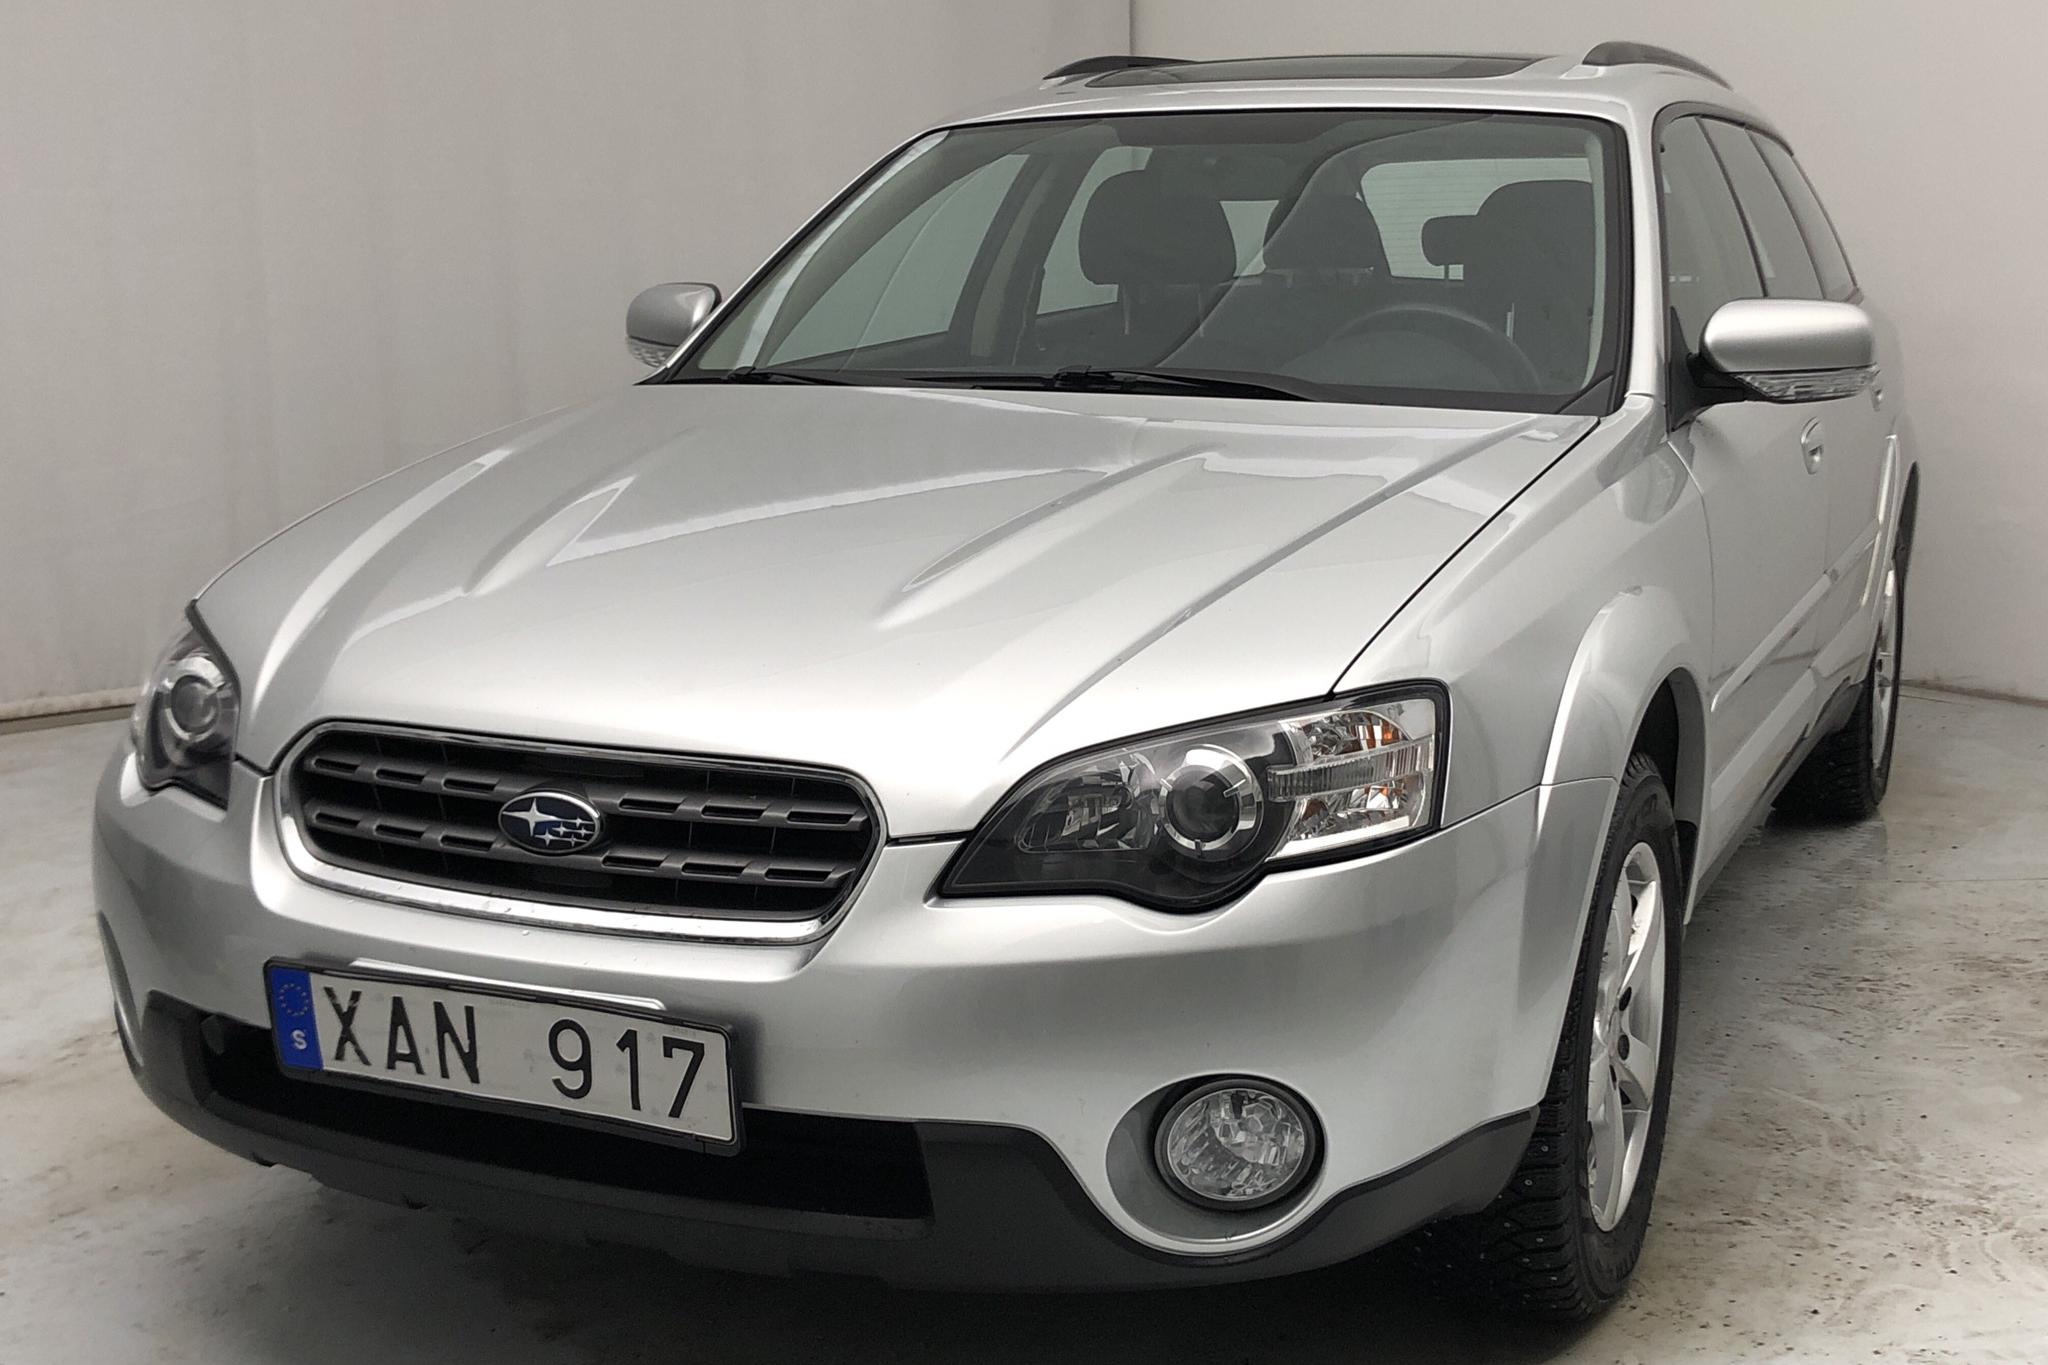 Subaru Outback 2.5i (165hk) - 8 589 mil - Automat - silver - 2006